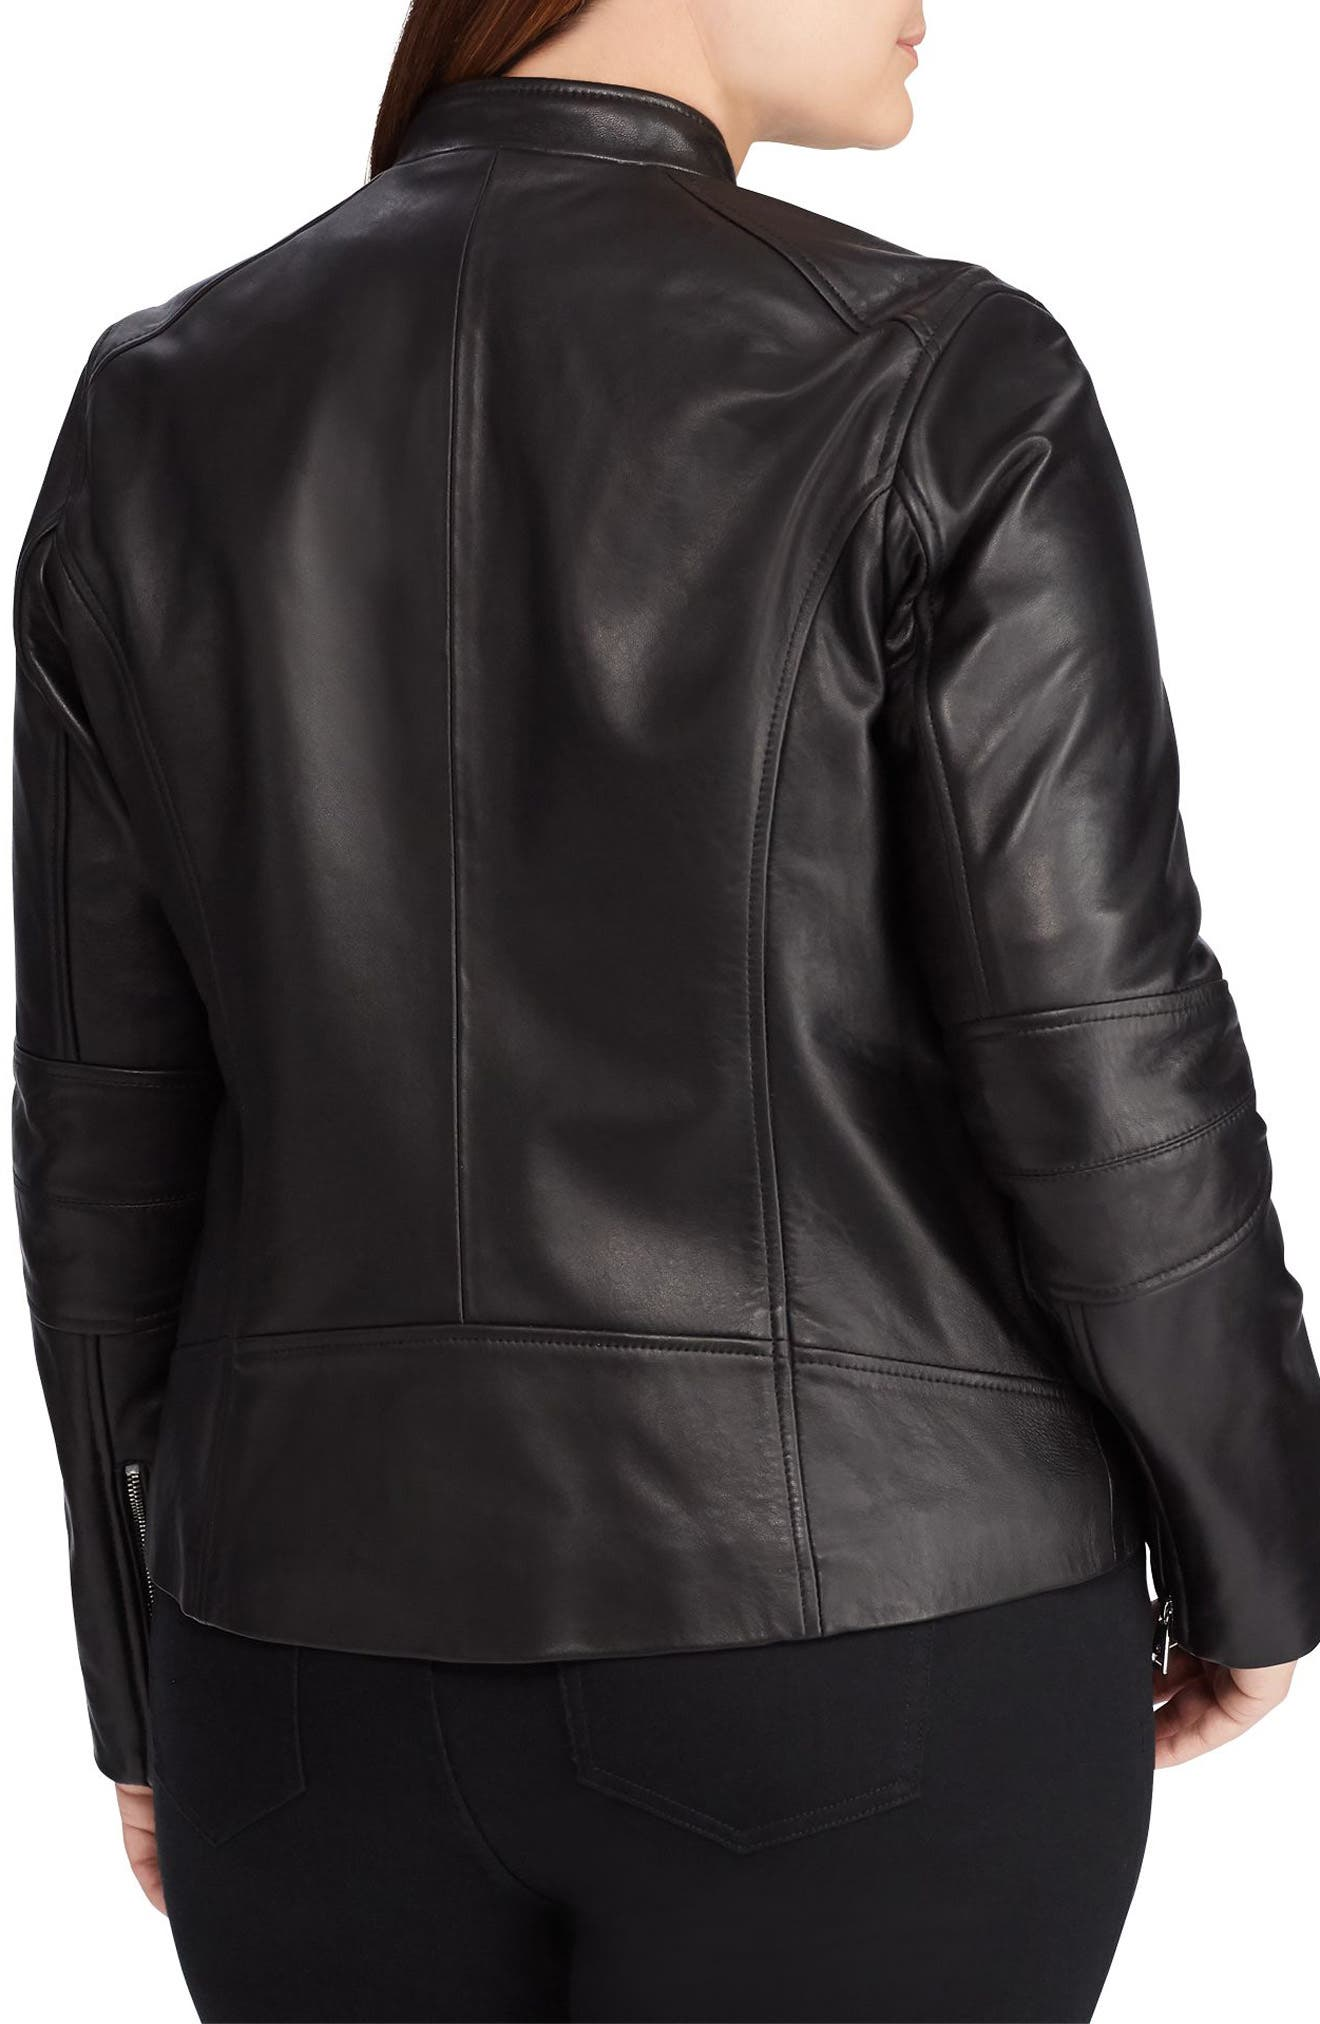 LAUREN RALPH LAUREN,                             Leather Moto Jacket,                             Alternate thumbnail 2, color,                             005